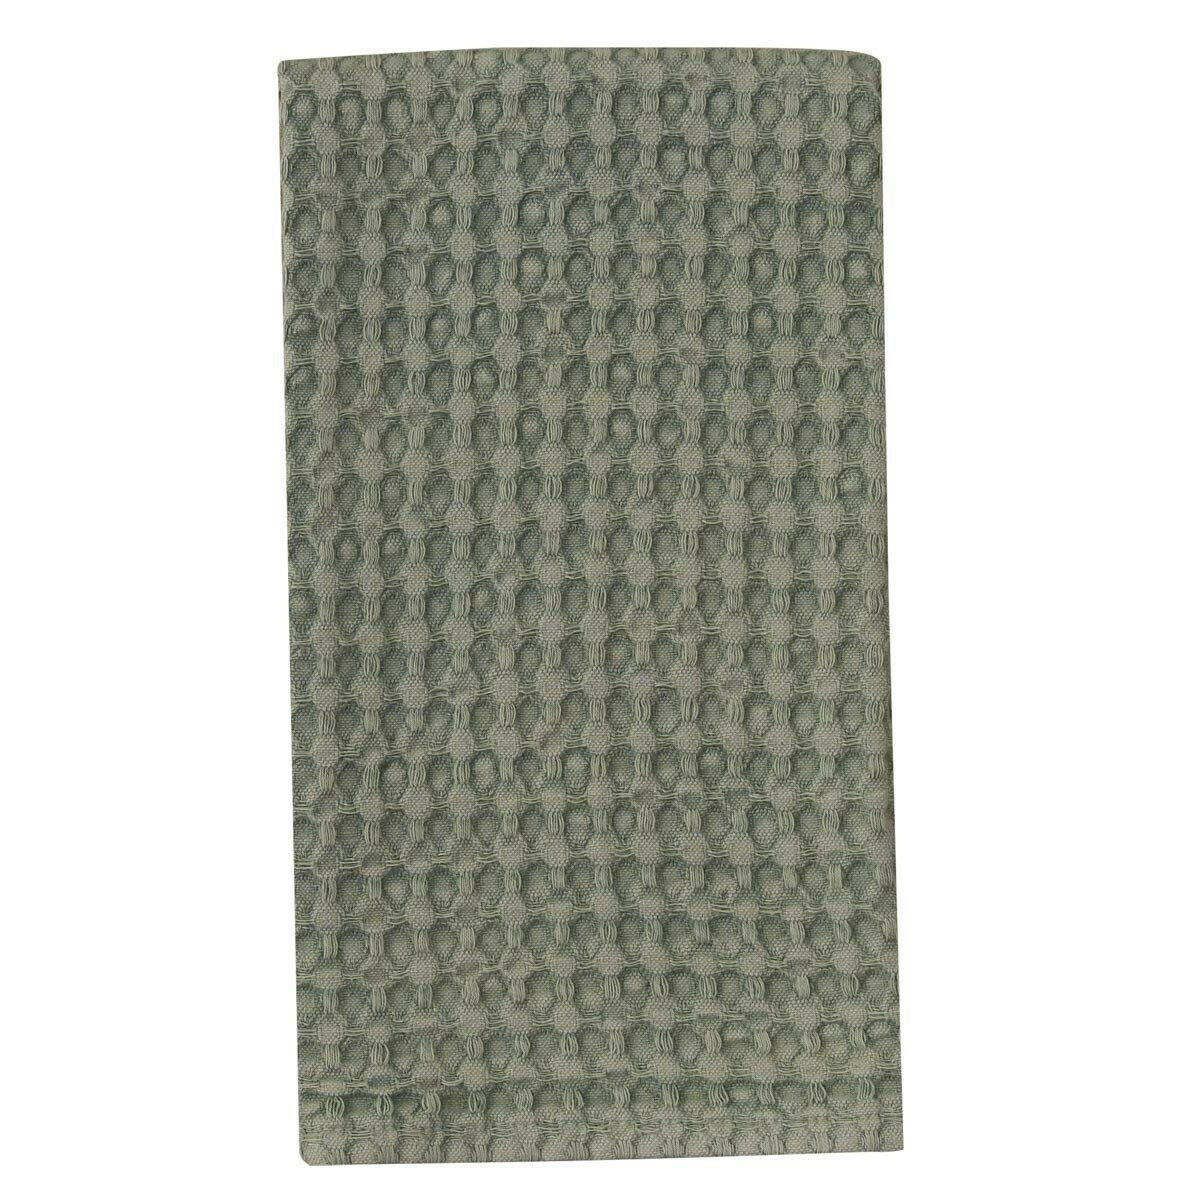 Celedon Waffle Weave Towel